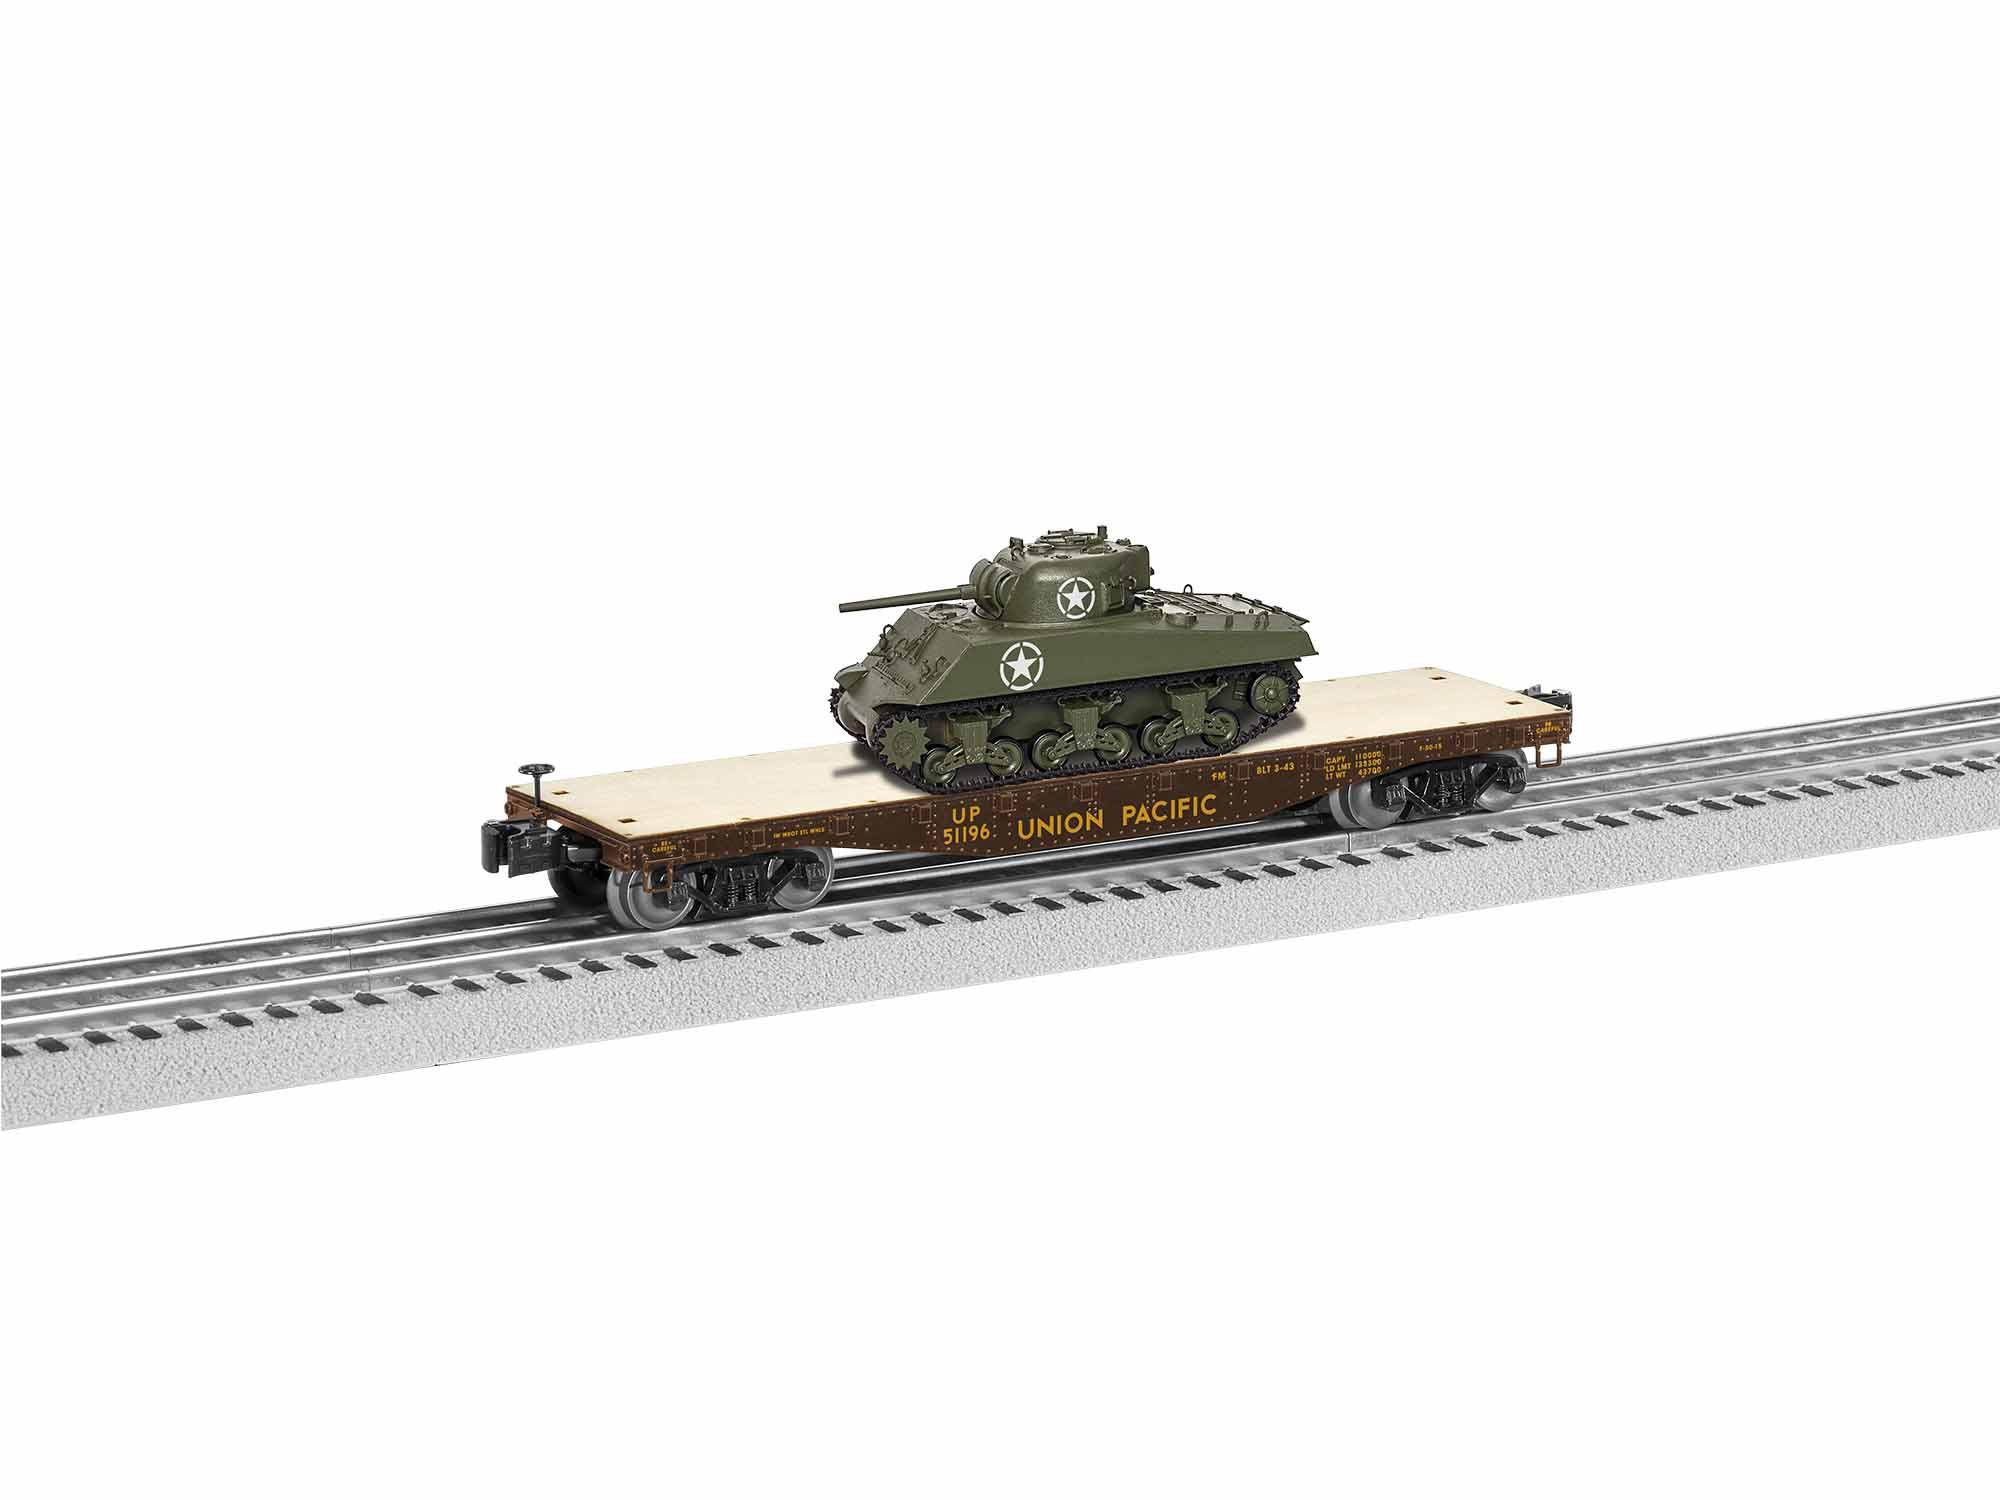 Lionel 1926742 O 40' Flatcar w/ Sherman Tank Load 3-Rail Union Pacific 51196 434-1926742